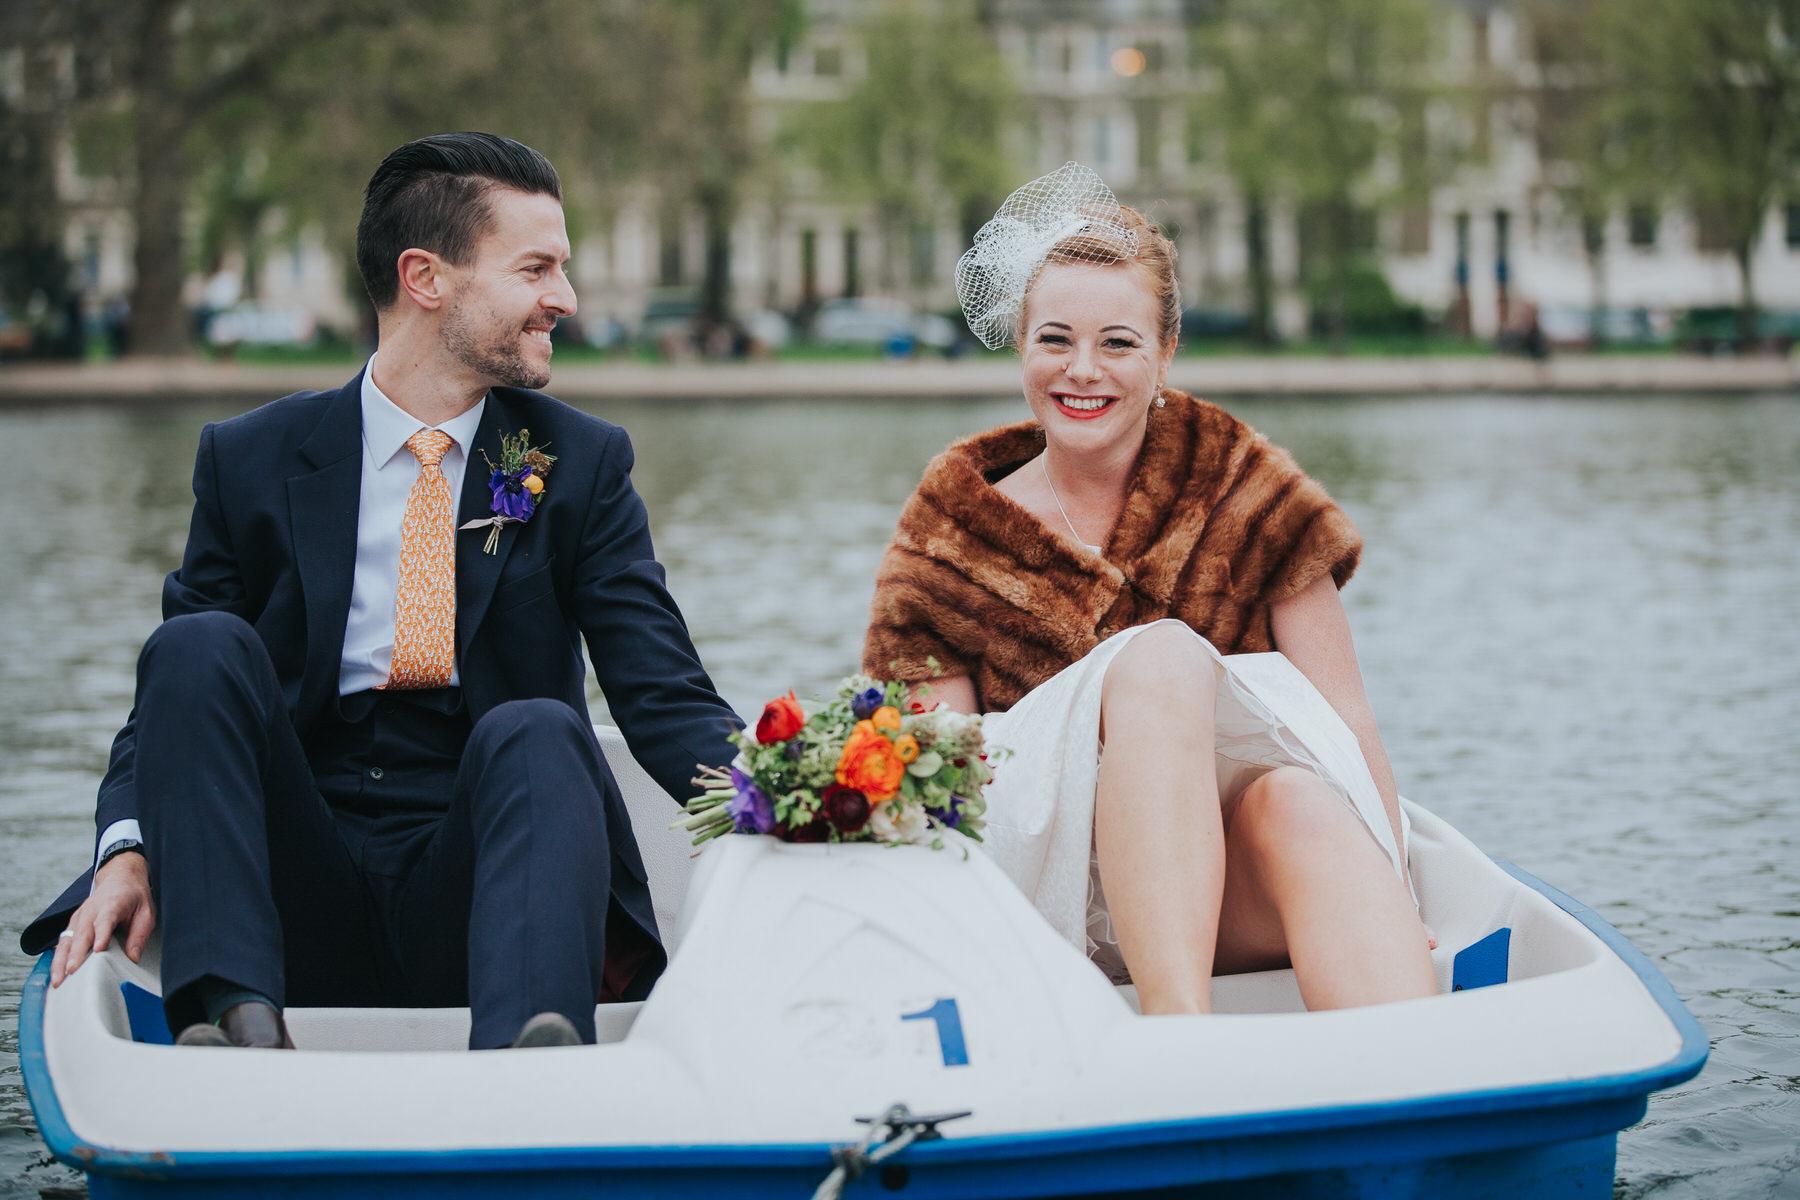 Victoria-park-alternative-wedding-couple-pedalo.jpg